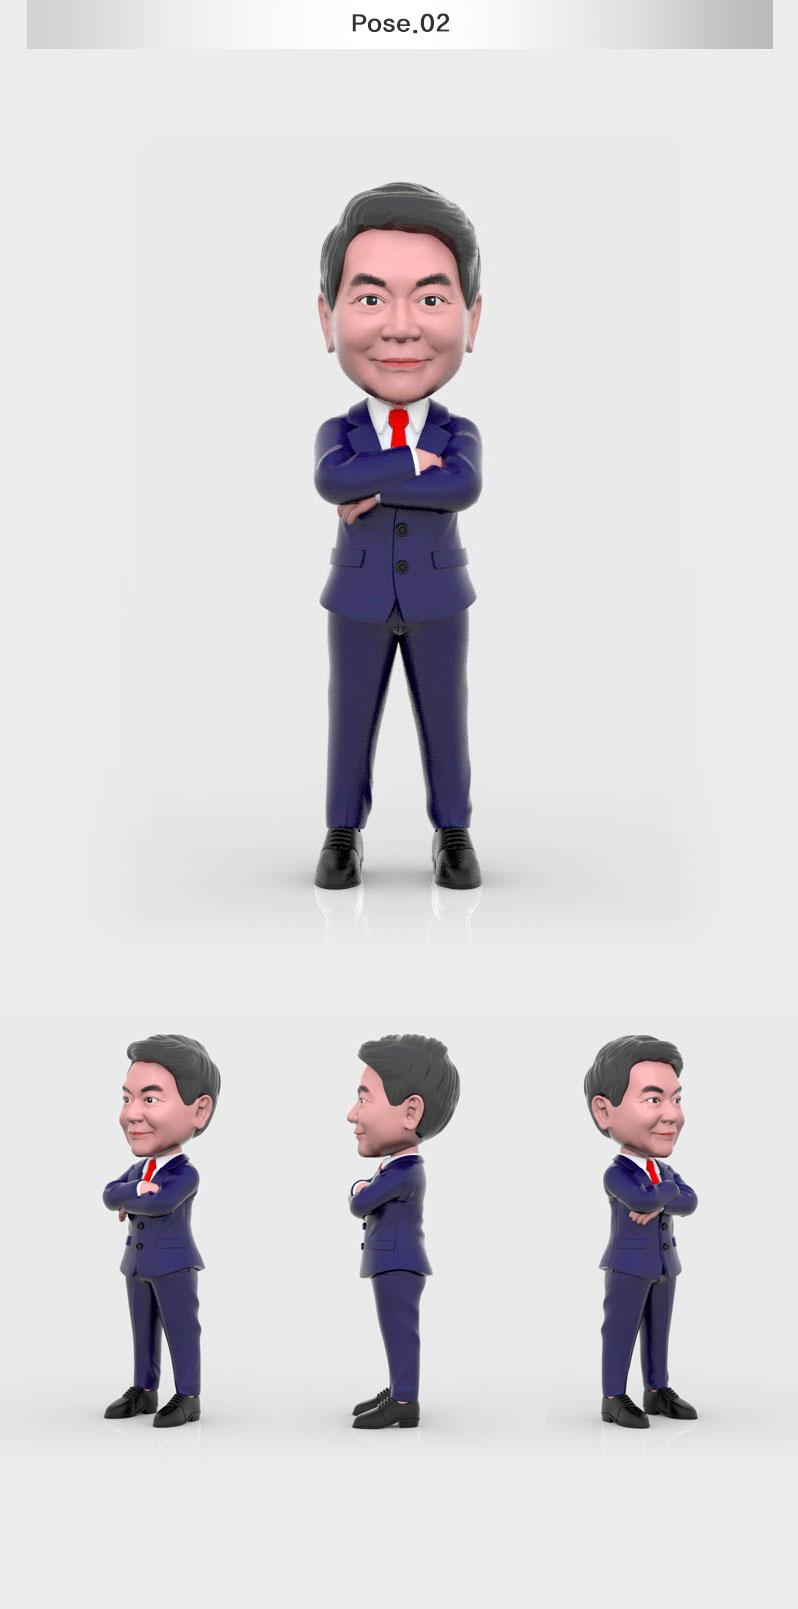 suit_pose02